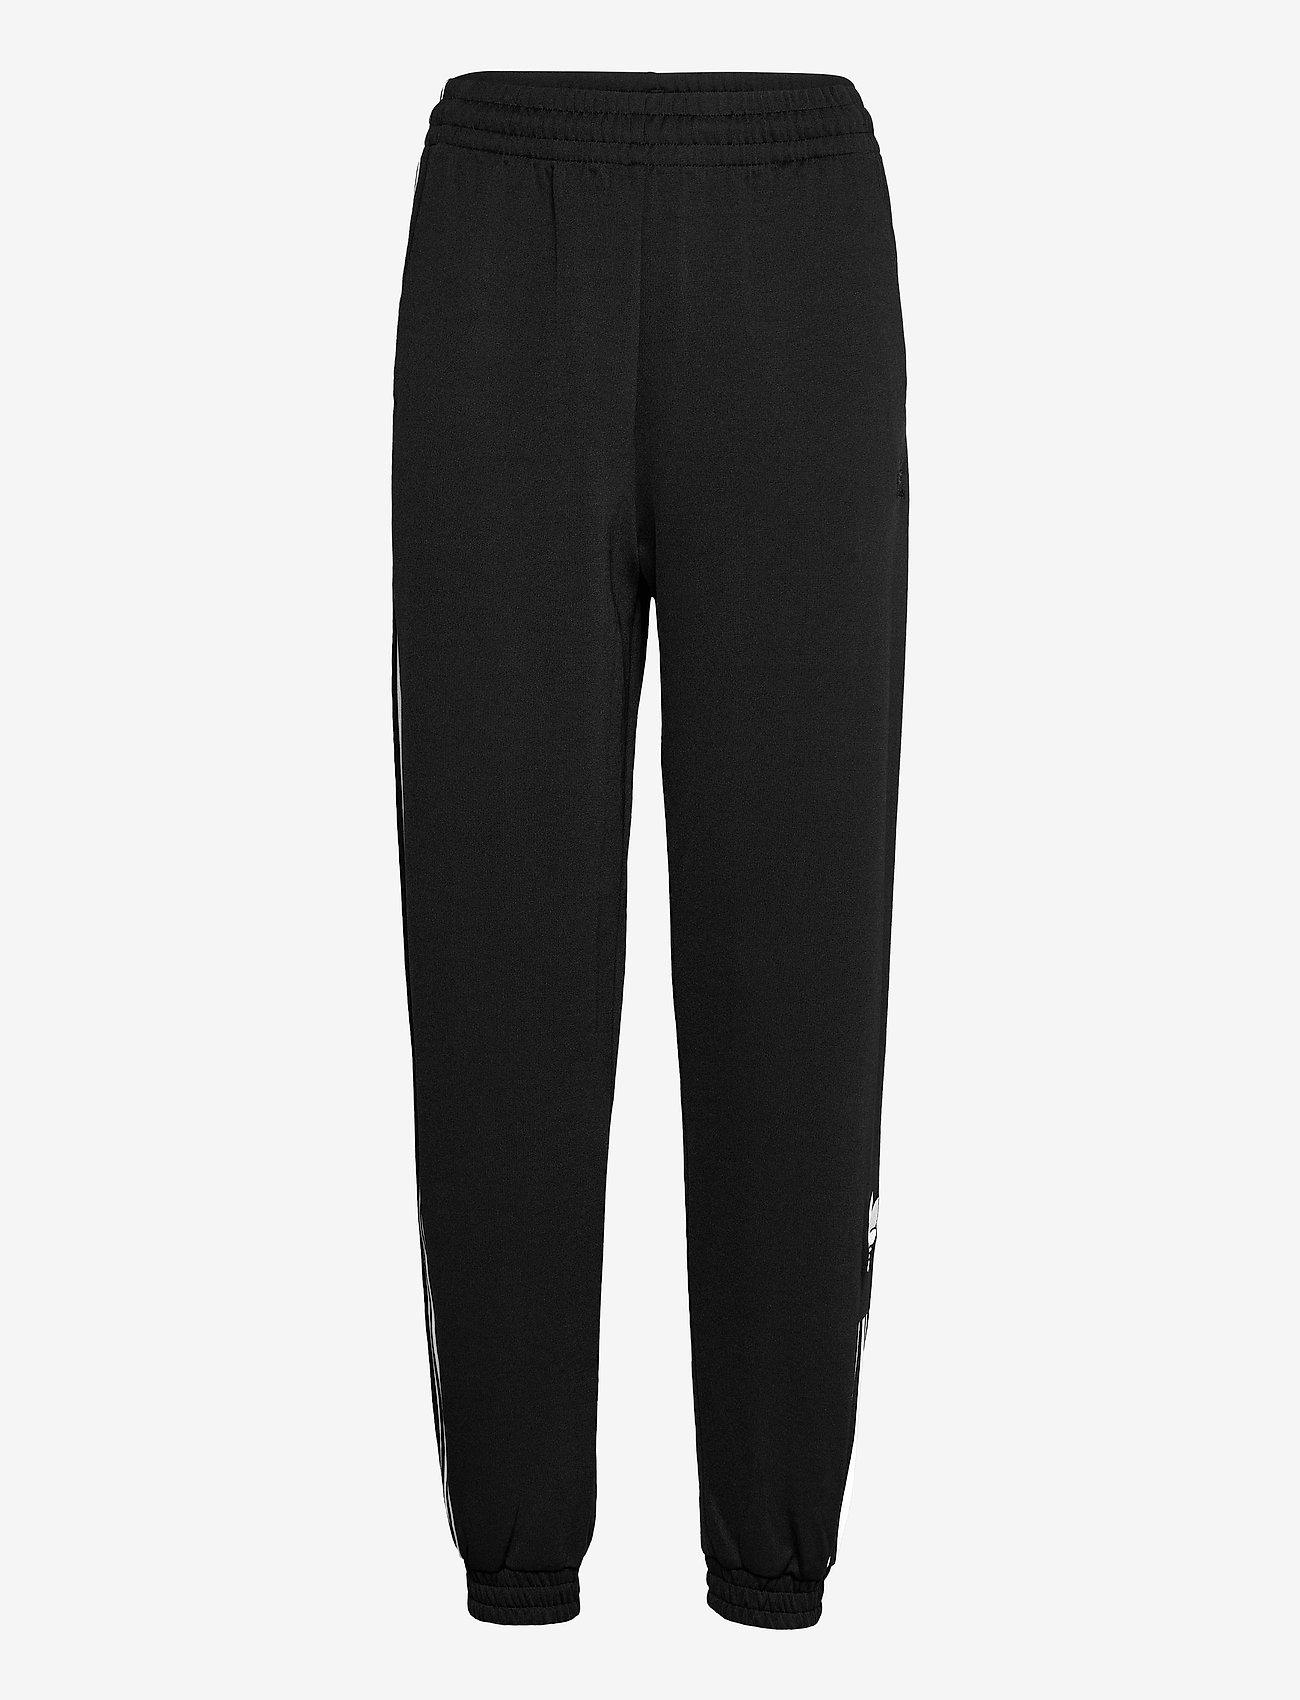 adidas Originals - Adicolor 3D Trefoil Track Pants W - trainingsbroek - black - 1